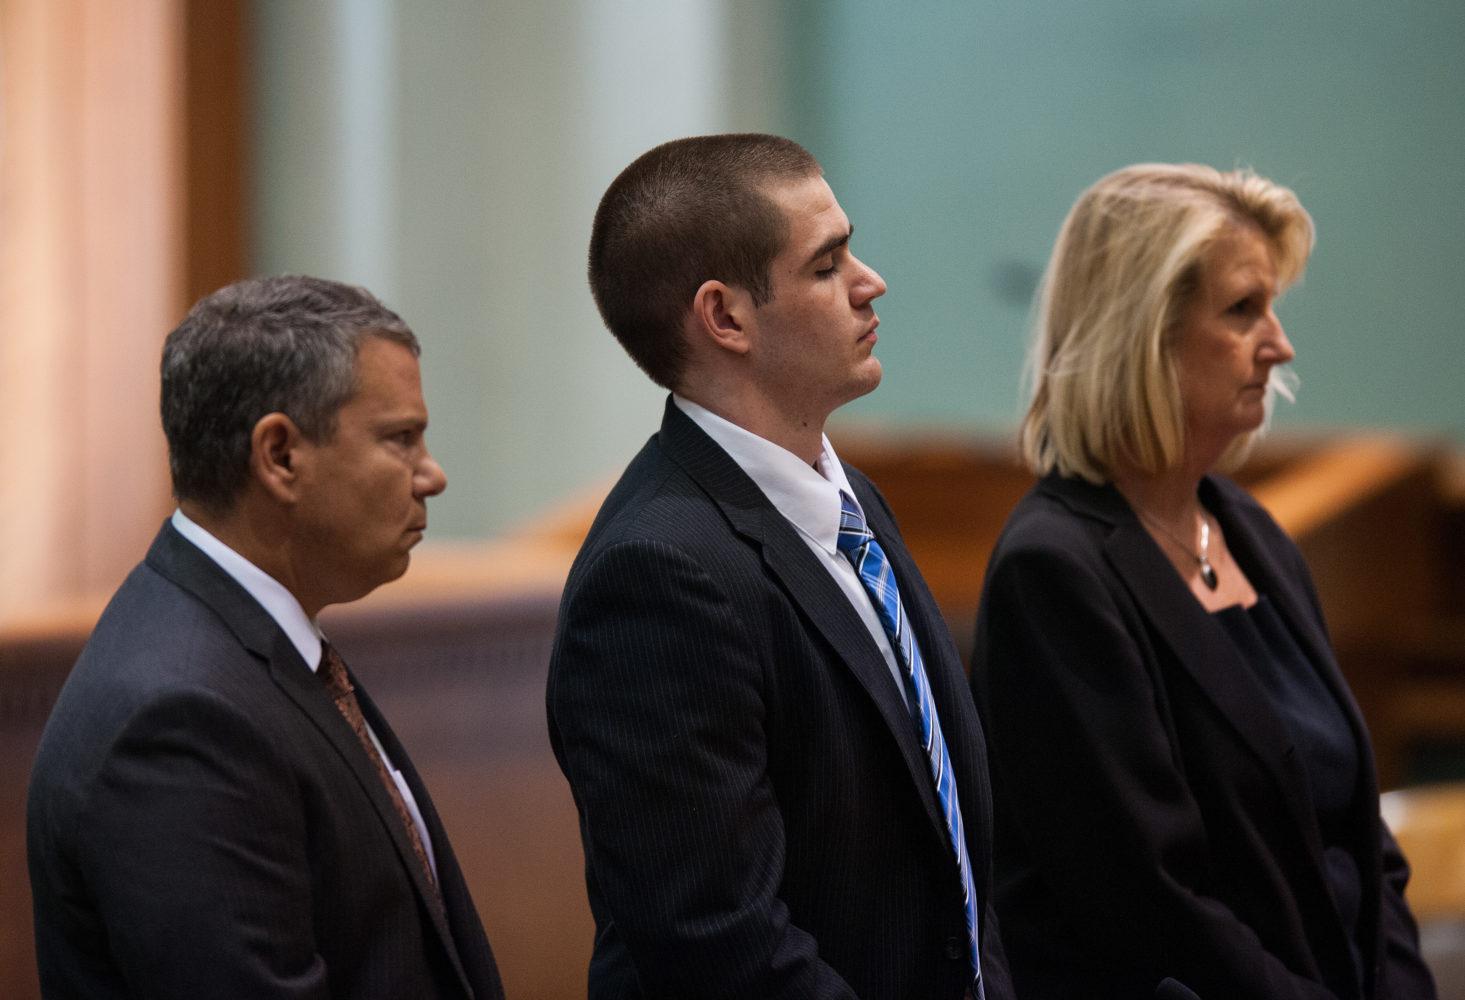 Adkison sentenced to 15 years on rape conviction